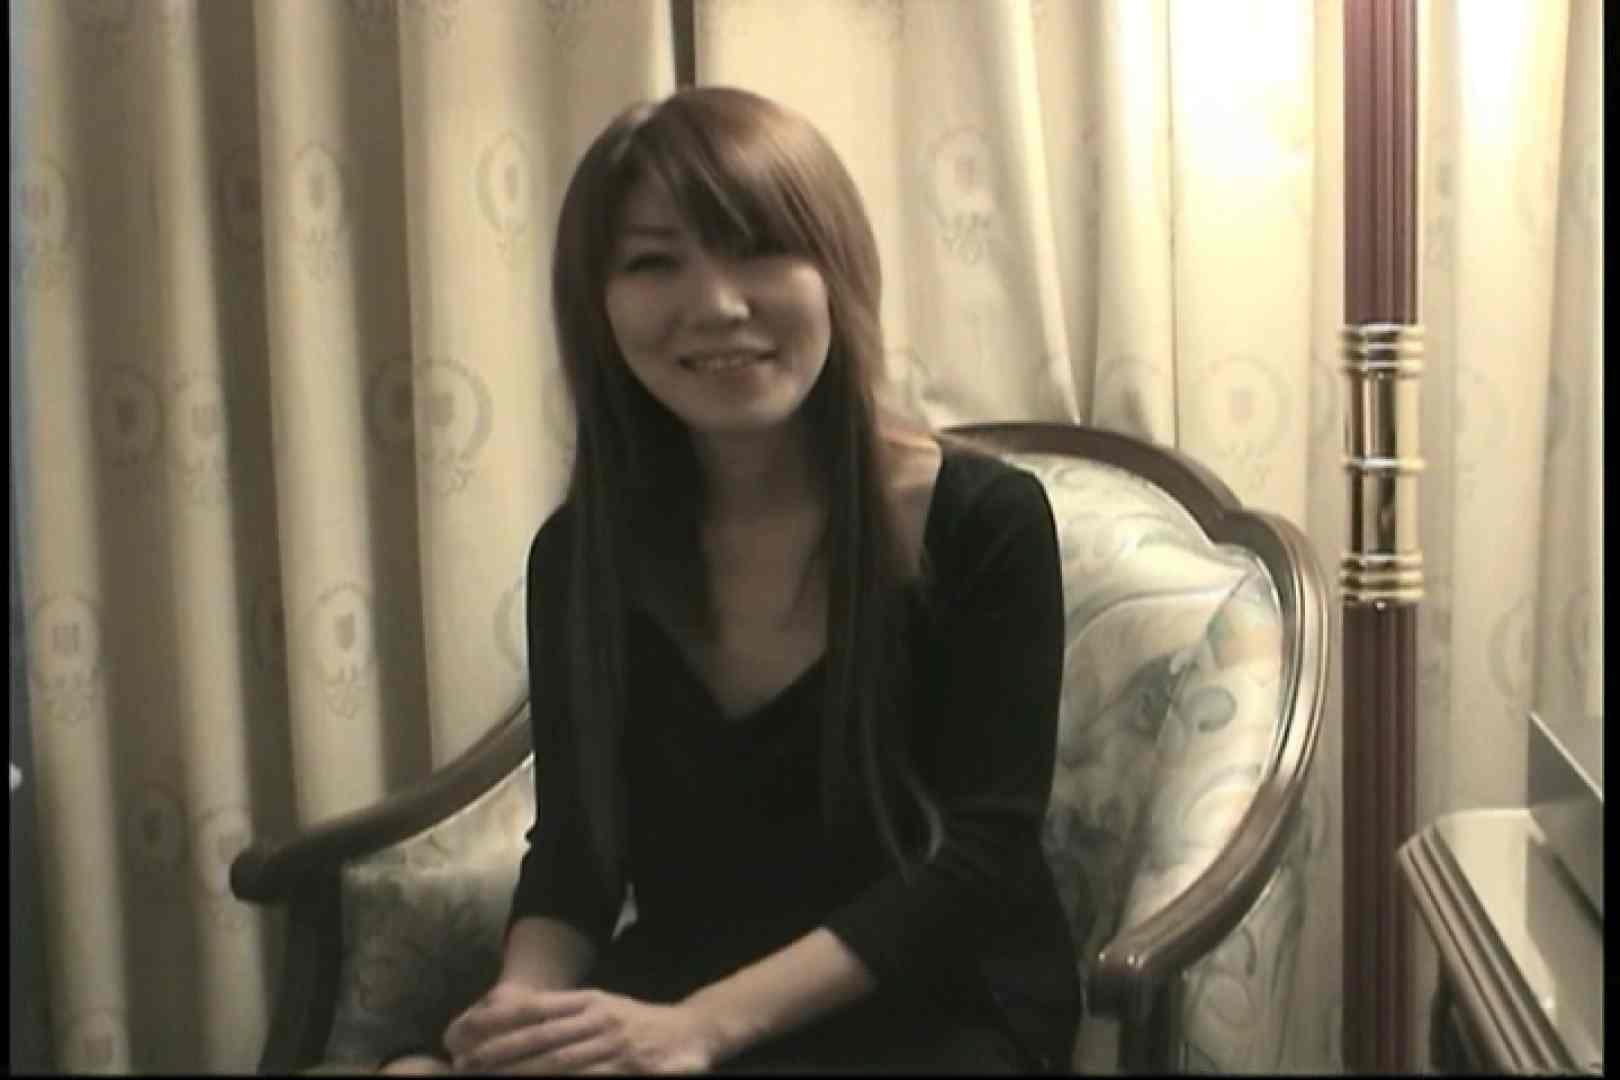 H大好きな清楚系の美ボディお姉さんとホテルでSEX~安西みか~ 電マ オマンコ無修正動画無料 60pic 8